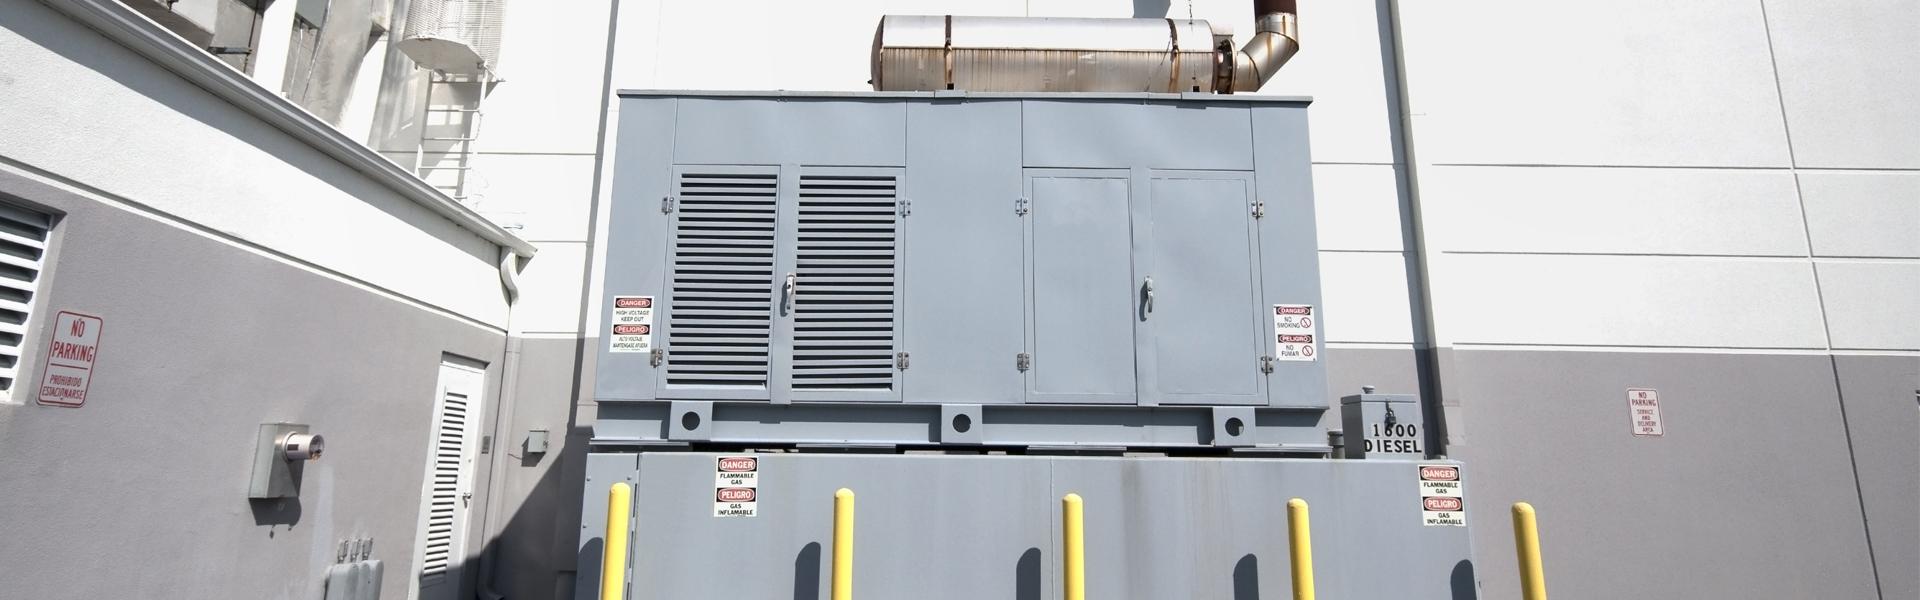 generator electricians